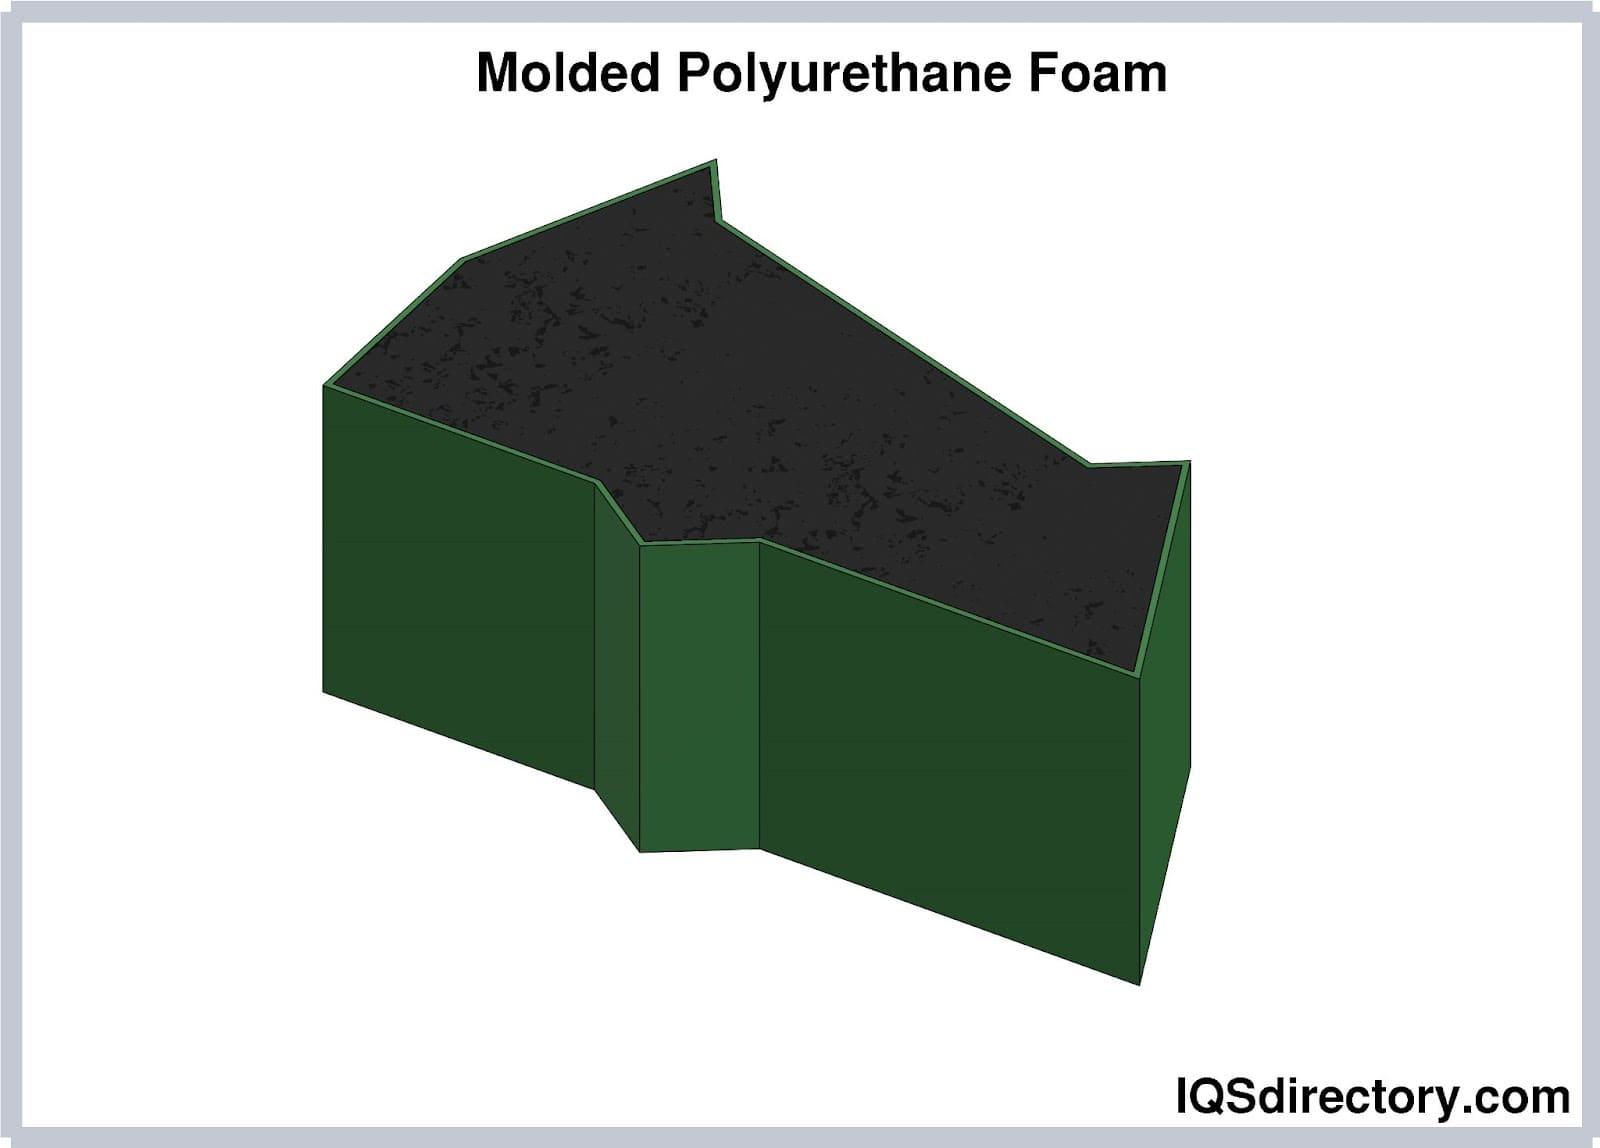 Molded Polyurethane Foam